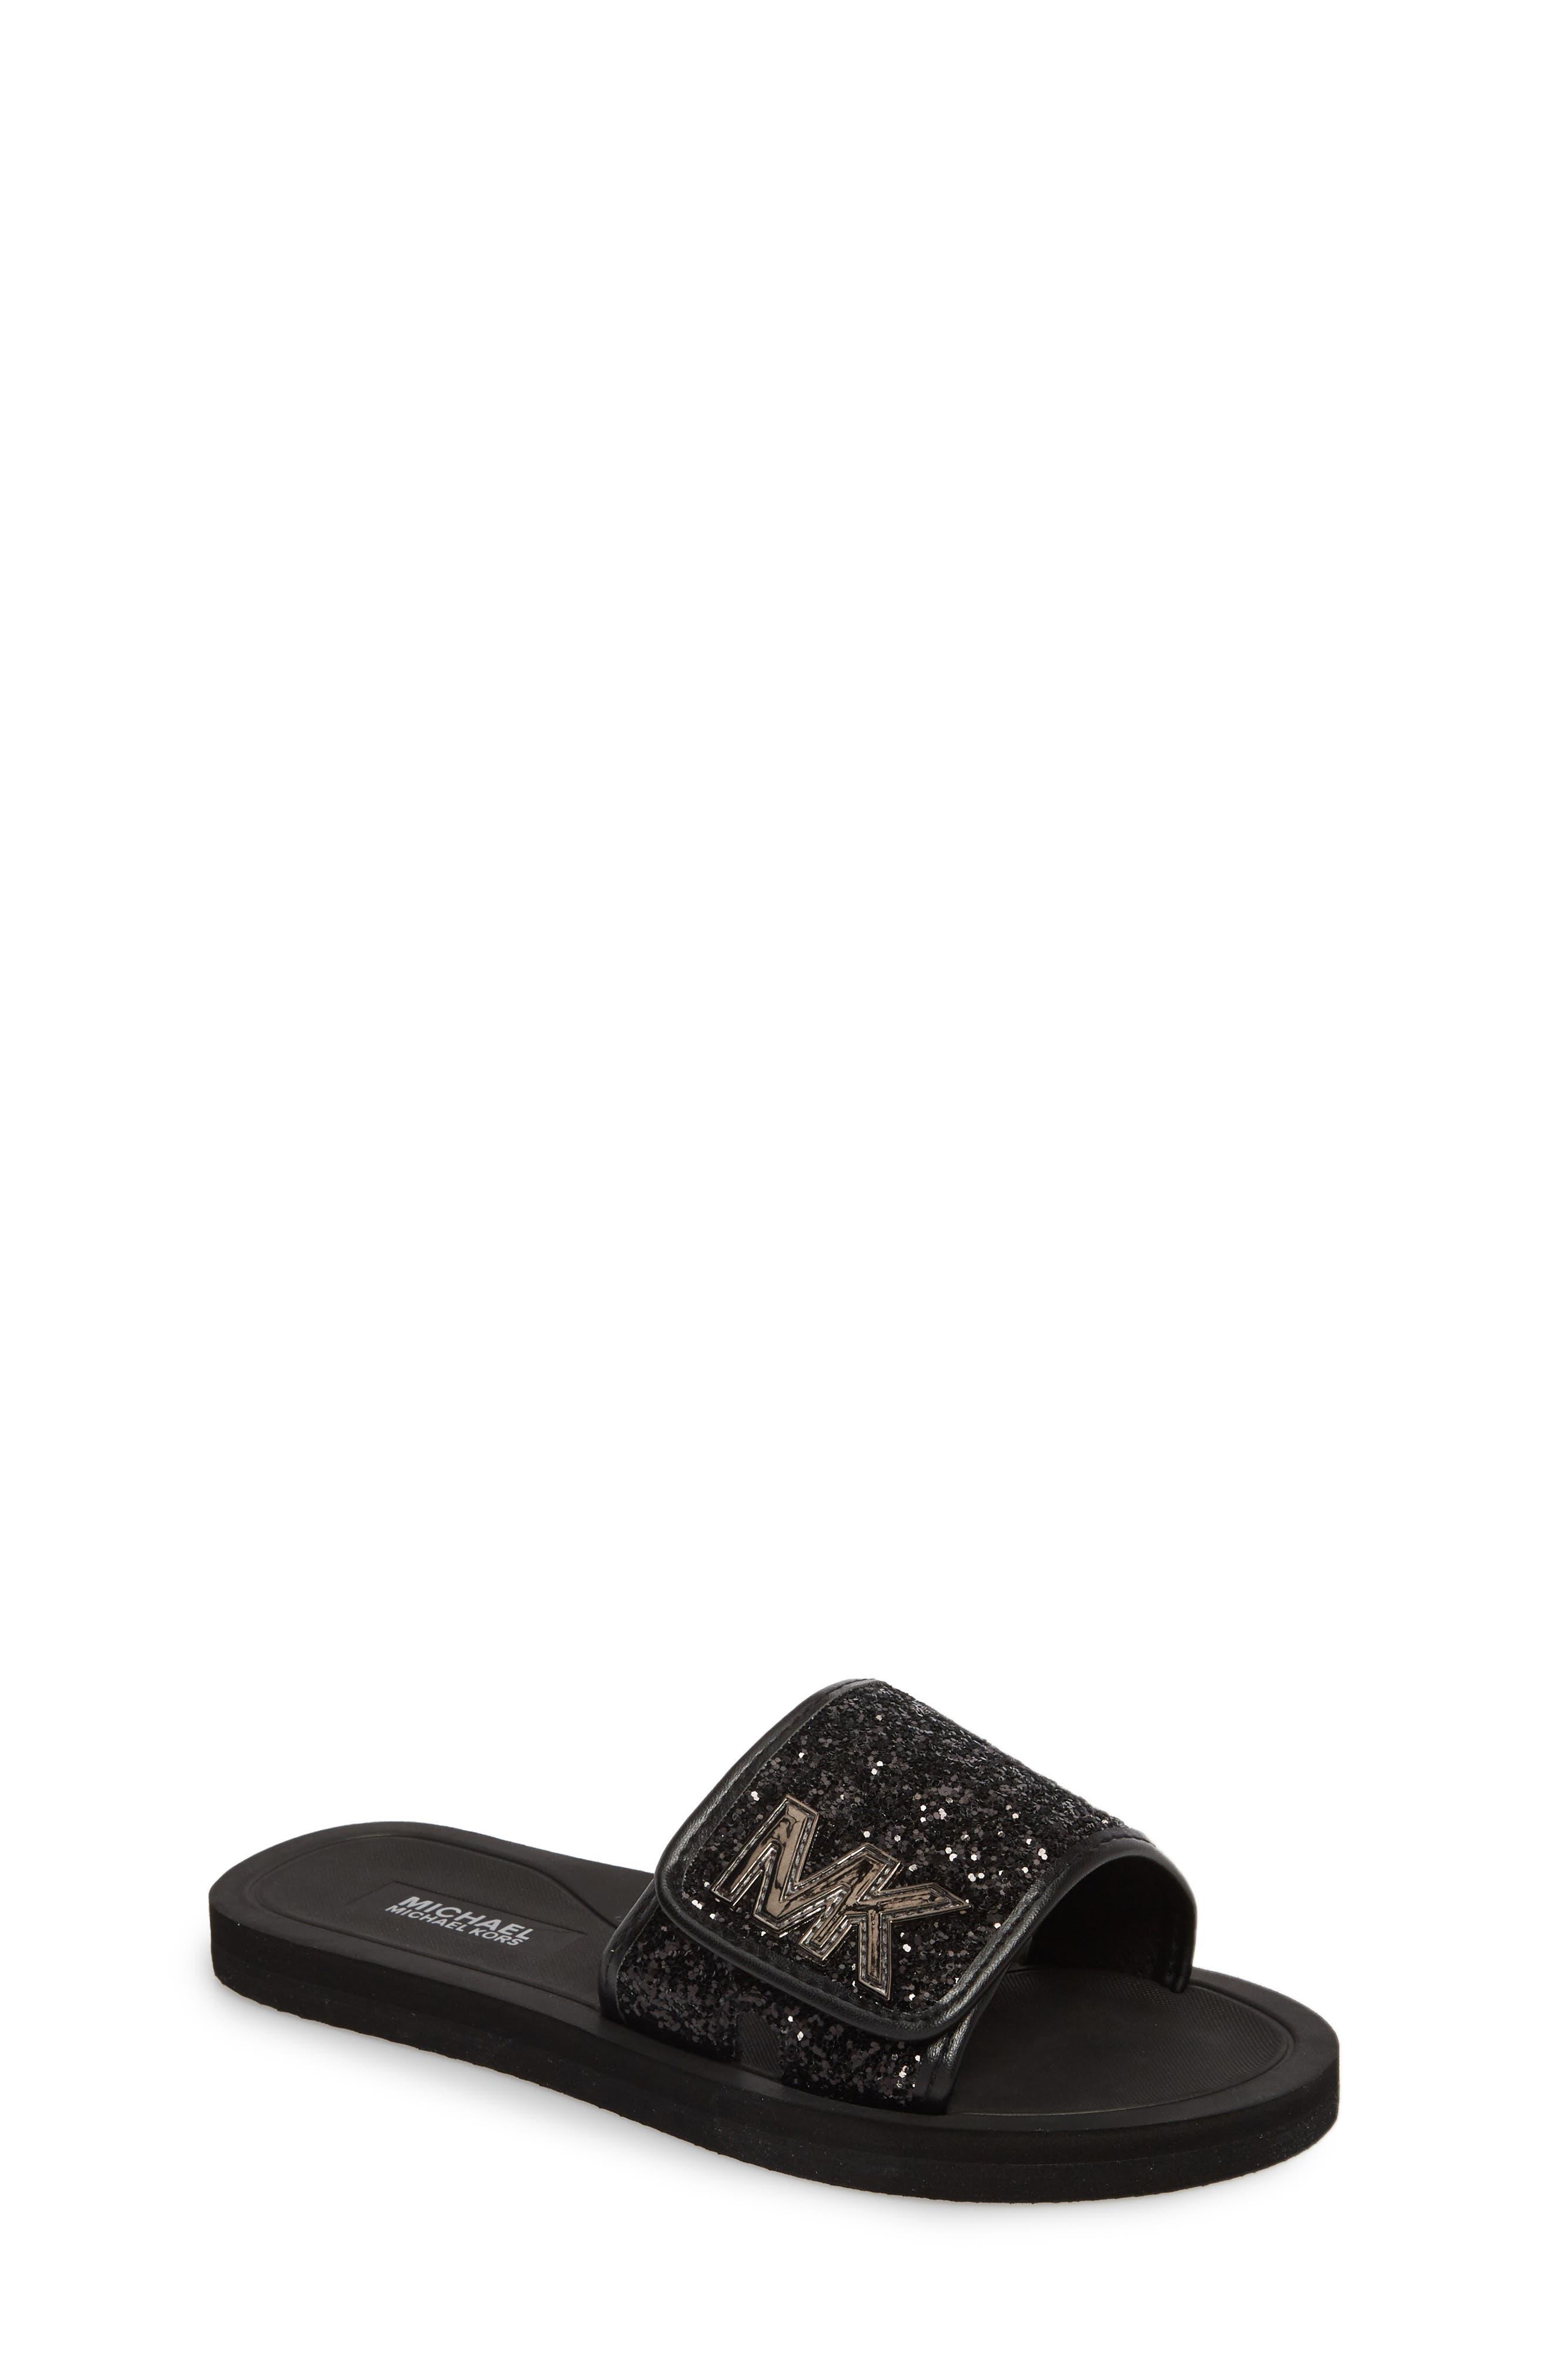 Eli Glitter Slide Sandal,                             Main thumbnail 1, color,                             Black